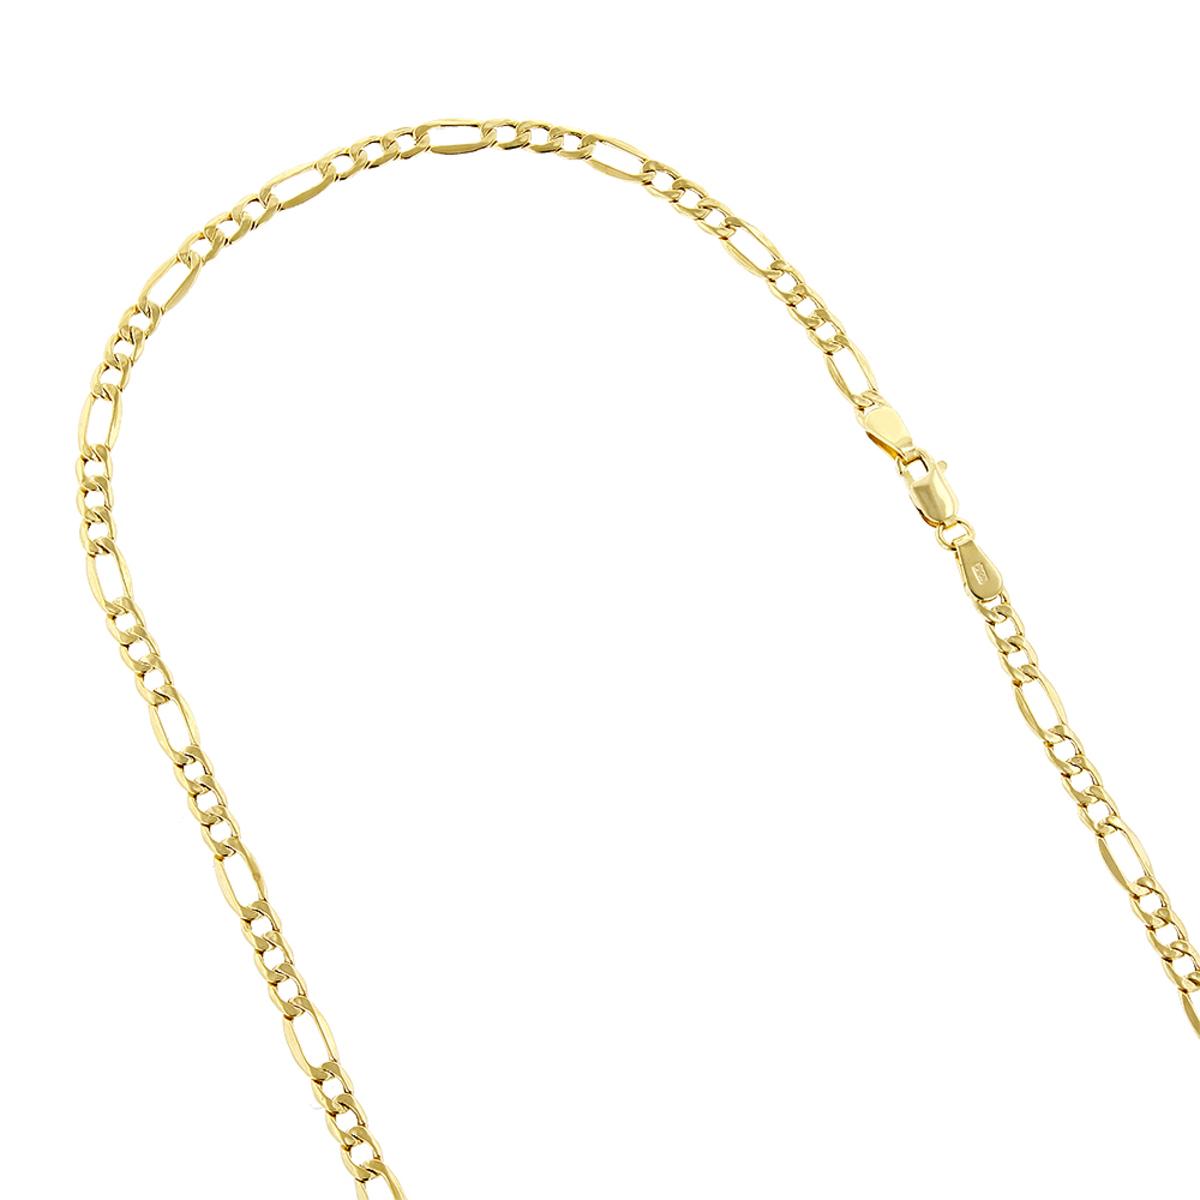 Hollow 14k Gold Figaro Chain For Men & Women 5.5mm Wide